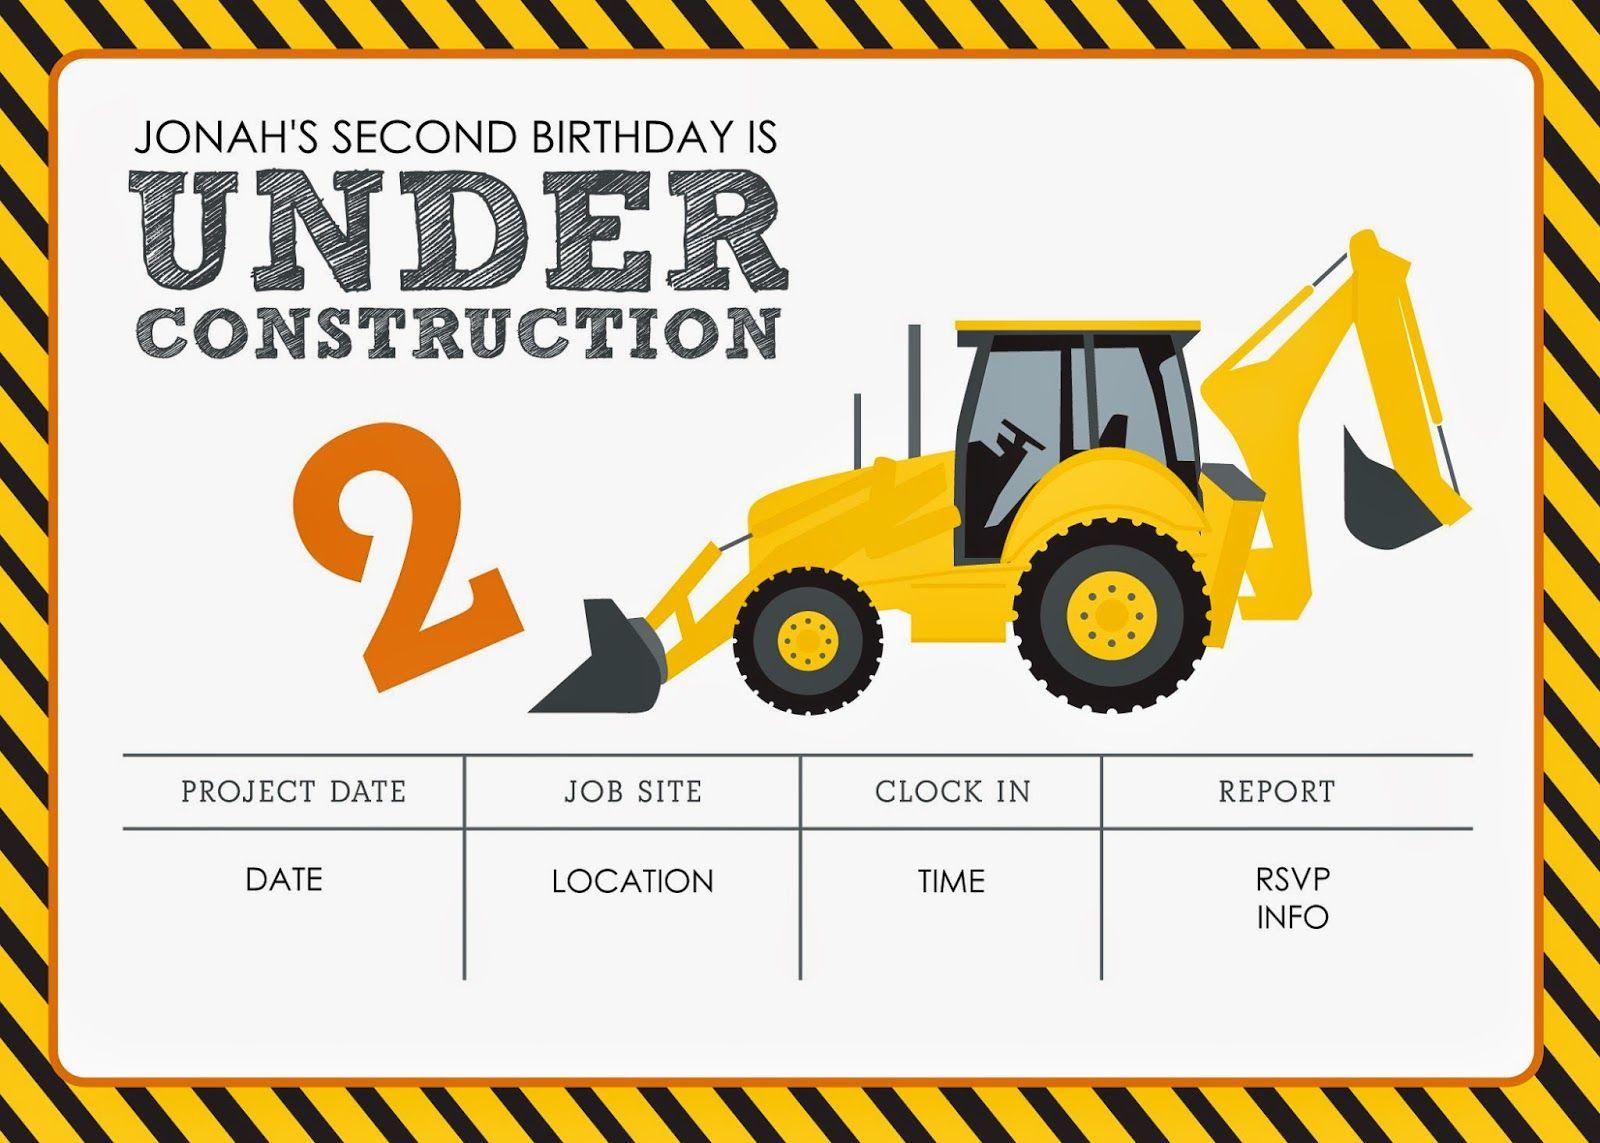 Construction Themed Birthday Party Free Printables | Jacqueline - Free Printable Construction Birthday Invitation Templates